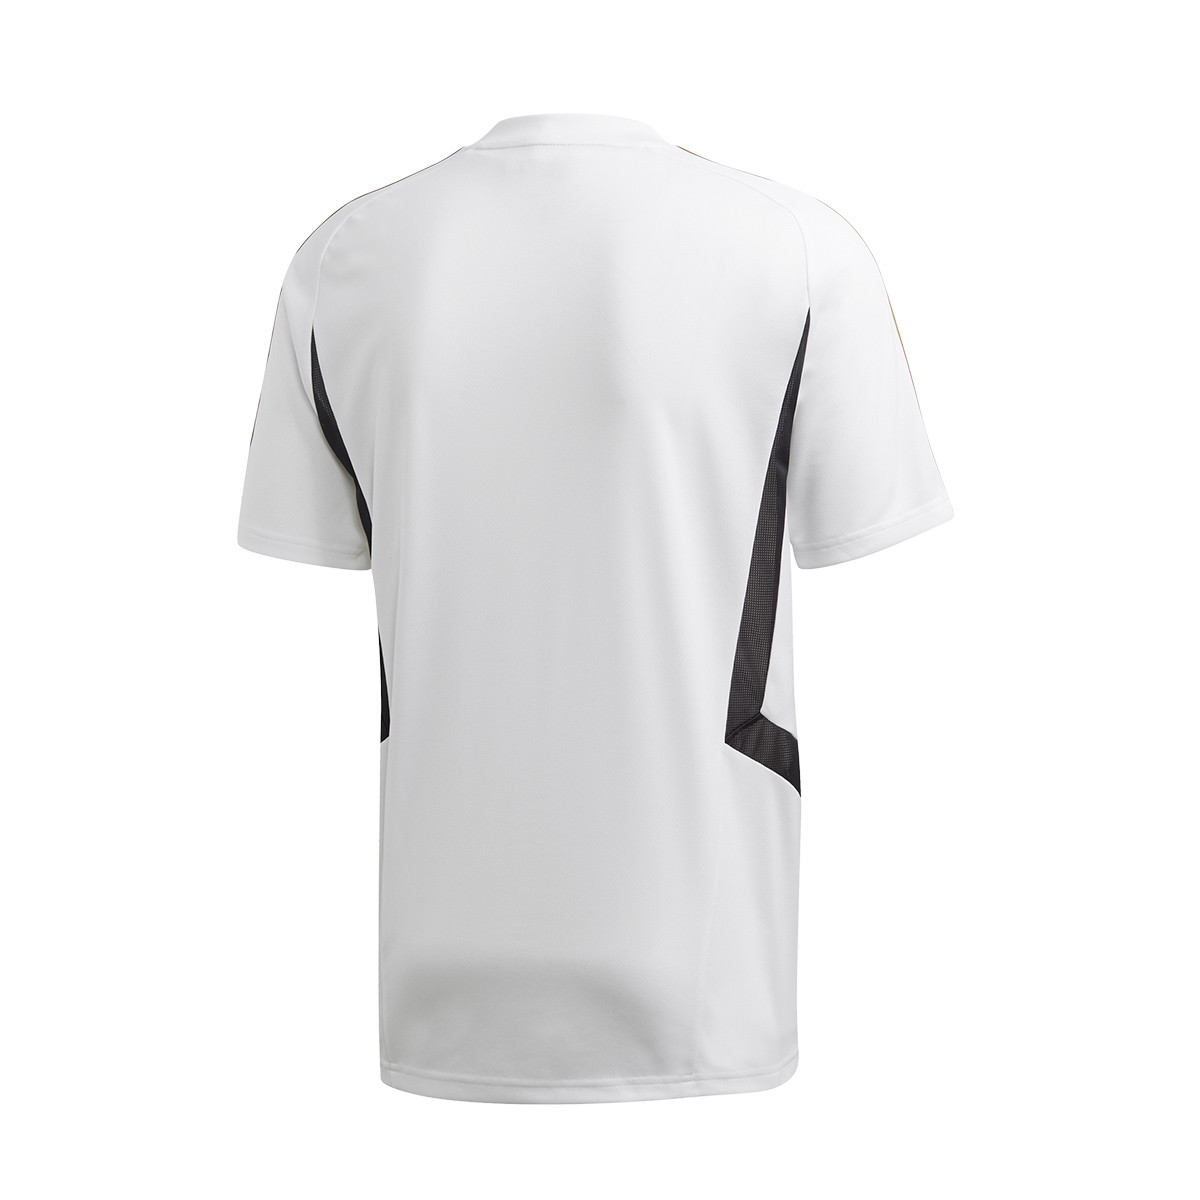 6e9061d7b45 Jersey adidas Real Madrid Training 2019-2020 White-Dark football gold -  Football store Fútbol Emotion